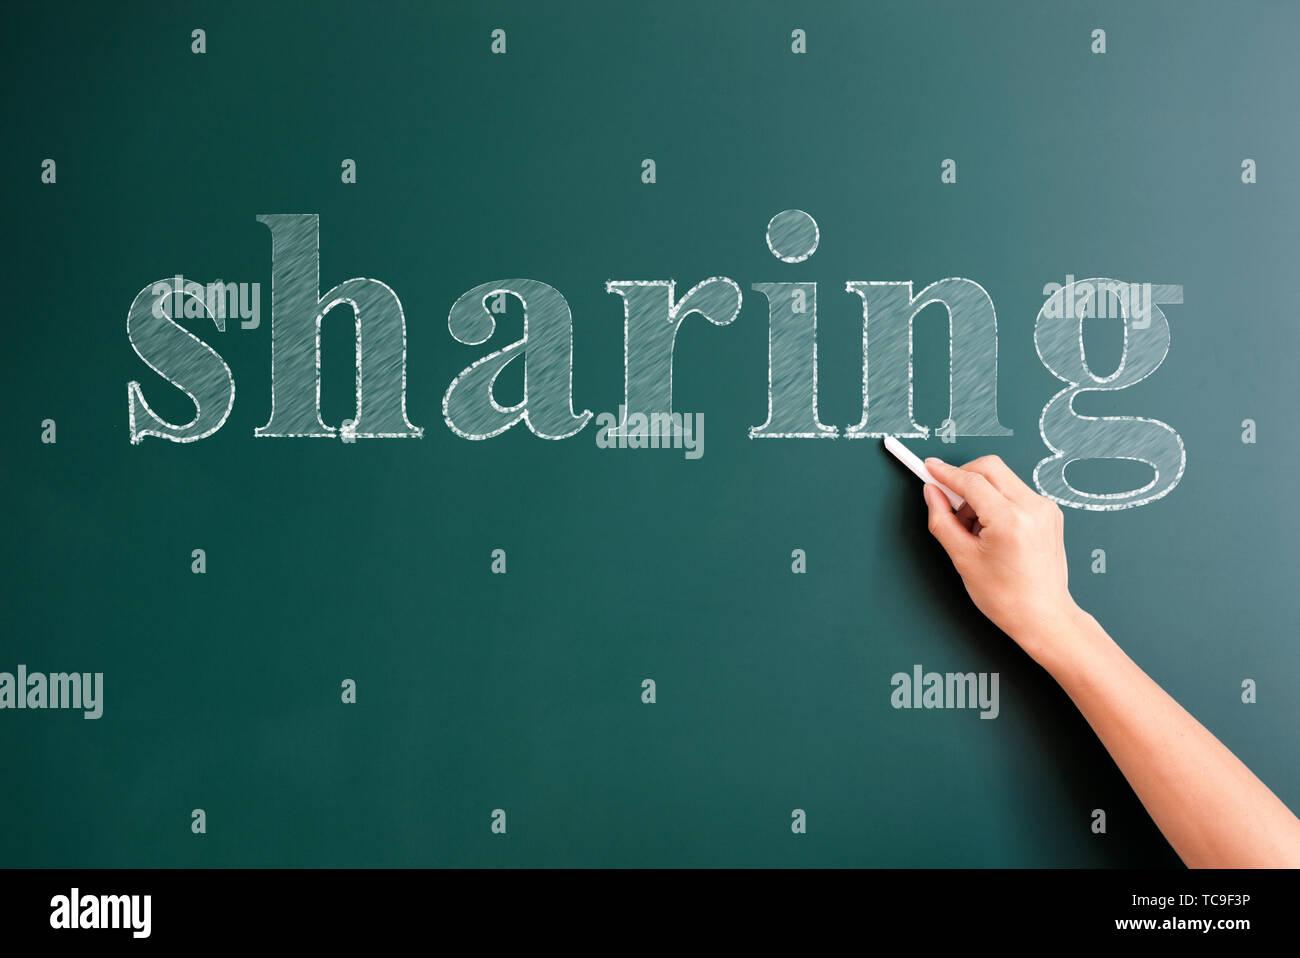 sharing written on blackboard - Stock Image